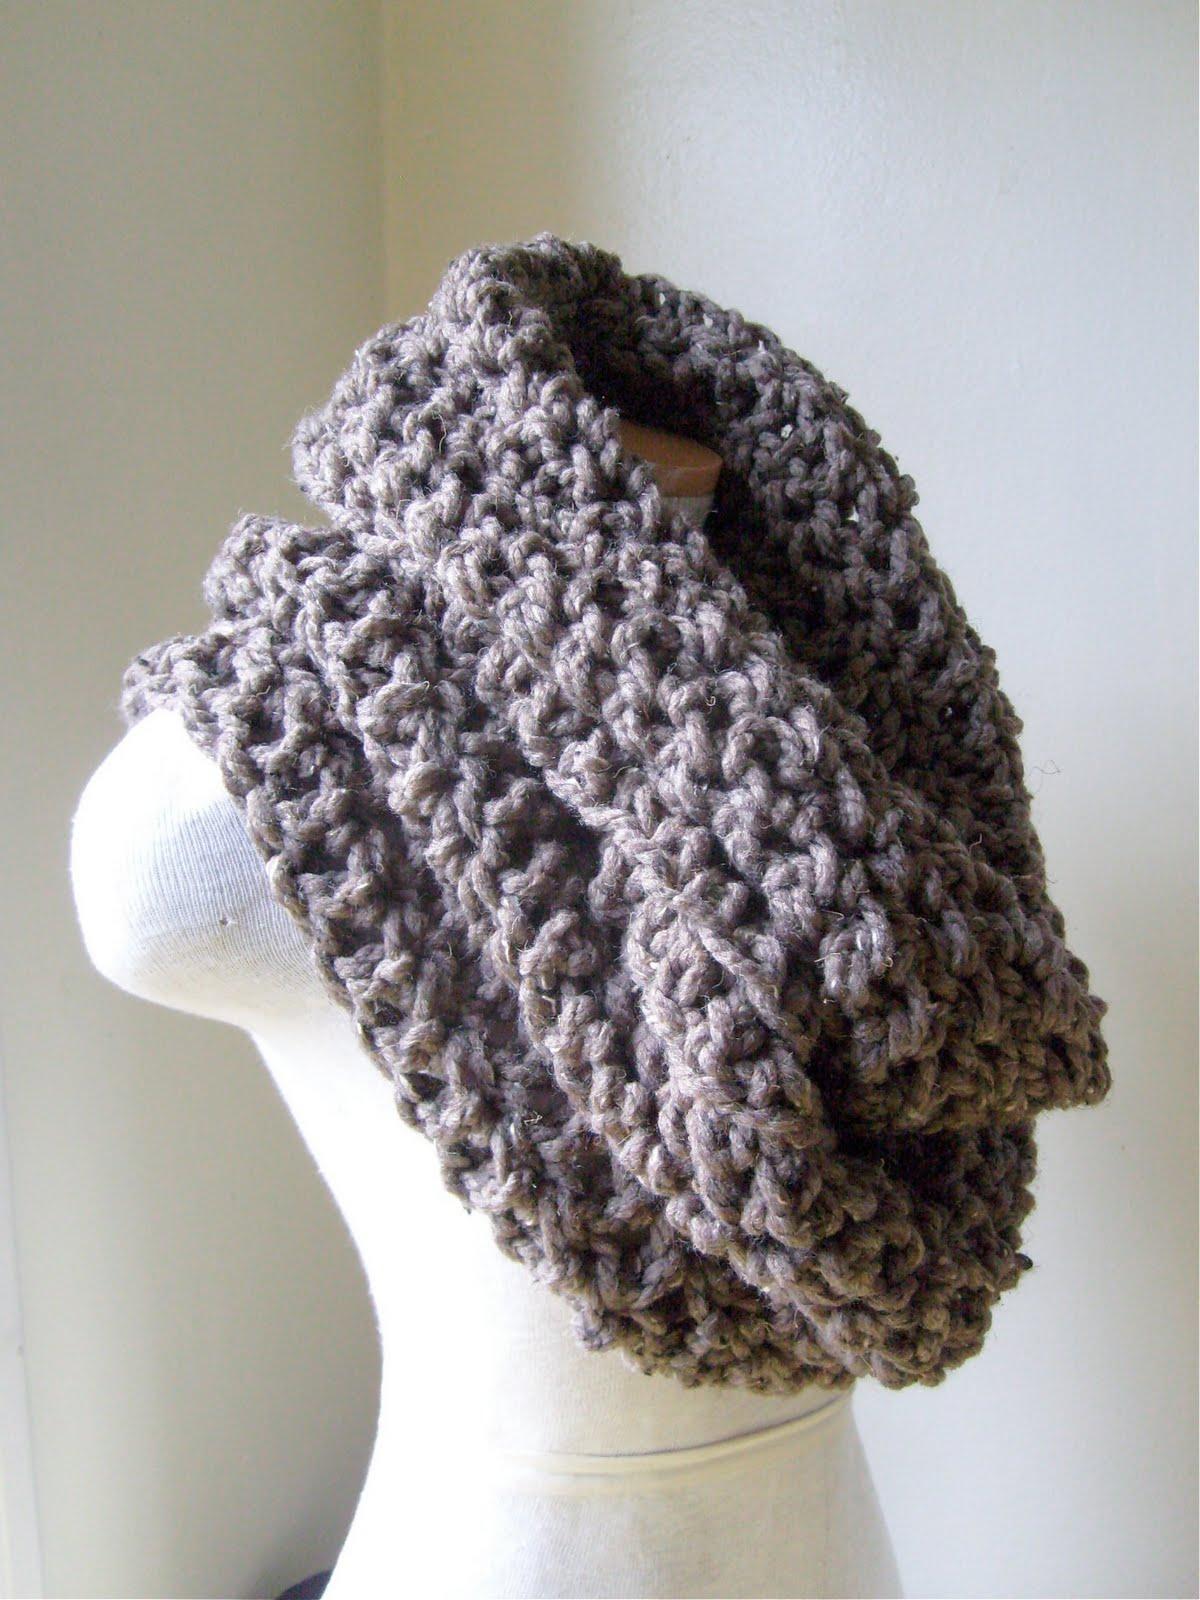 Crocheted Cowl Neckwarmers